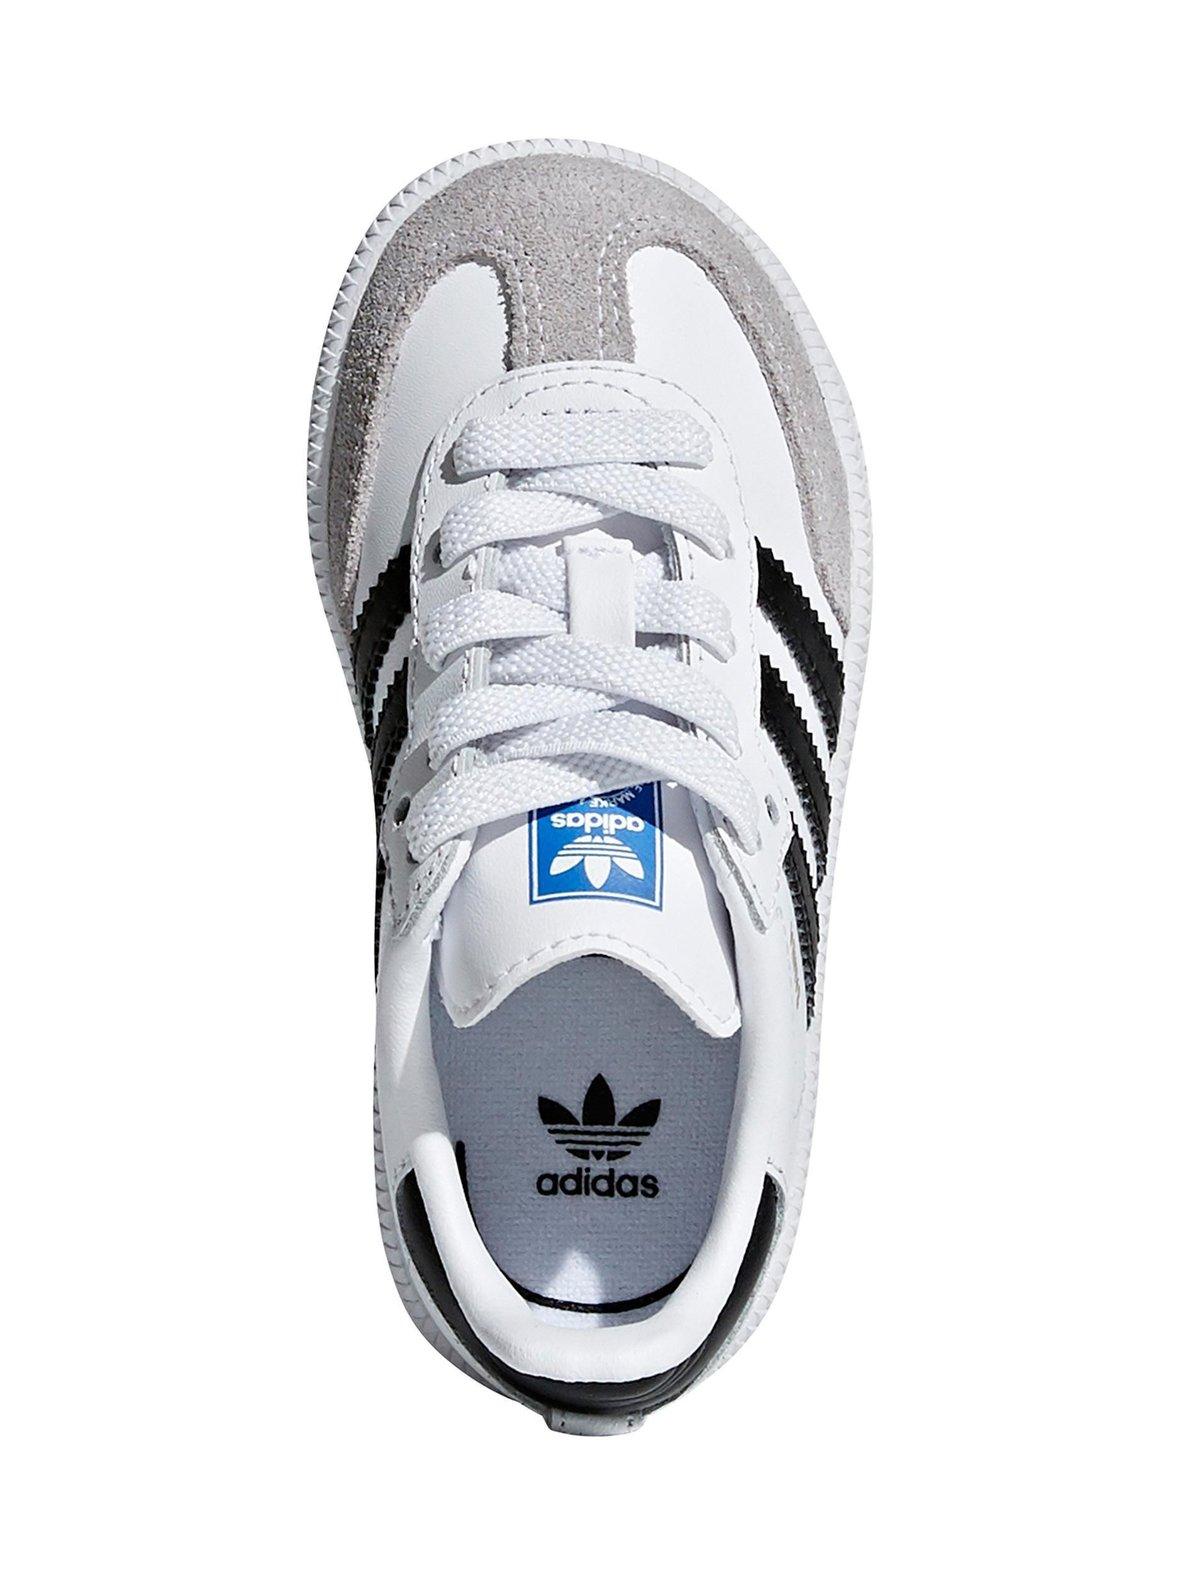 low priced edffd 6af7a White Adidas Originals Samba-tennarit   26   Lapset   Stockmann